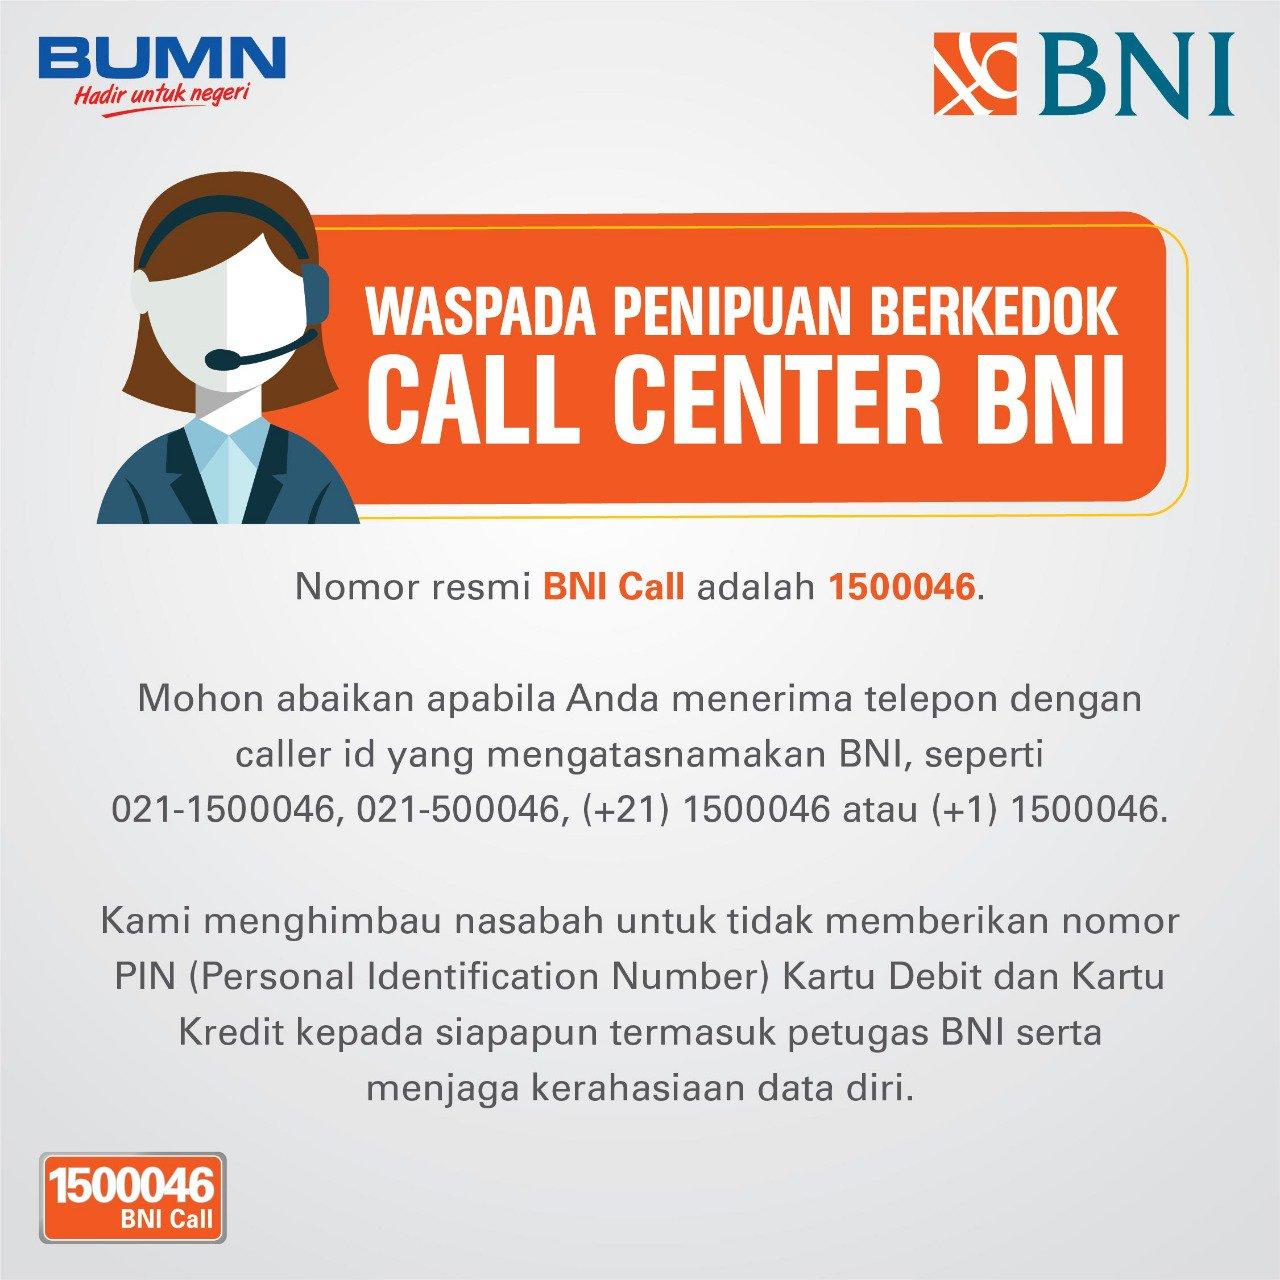 Pt Bank Negara Indonesia Persero Tbk On Twitter Sahabat Bni Tengah Marak Kasus Penipuan Yang Mengatasnamakan Call Center Bni Melalui Telepon Nomor Resmi Bni Call Adalah 1500046 Kami Menghimbau Nasabah Tidak Memberikan No